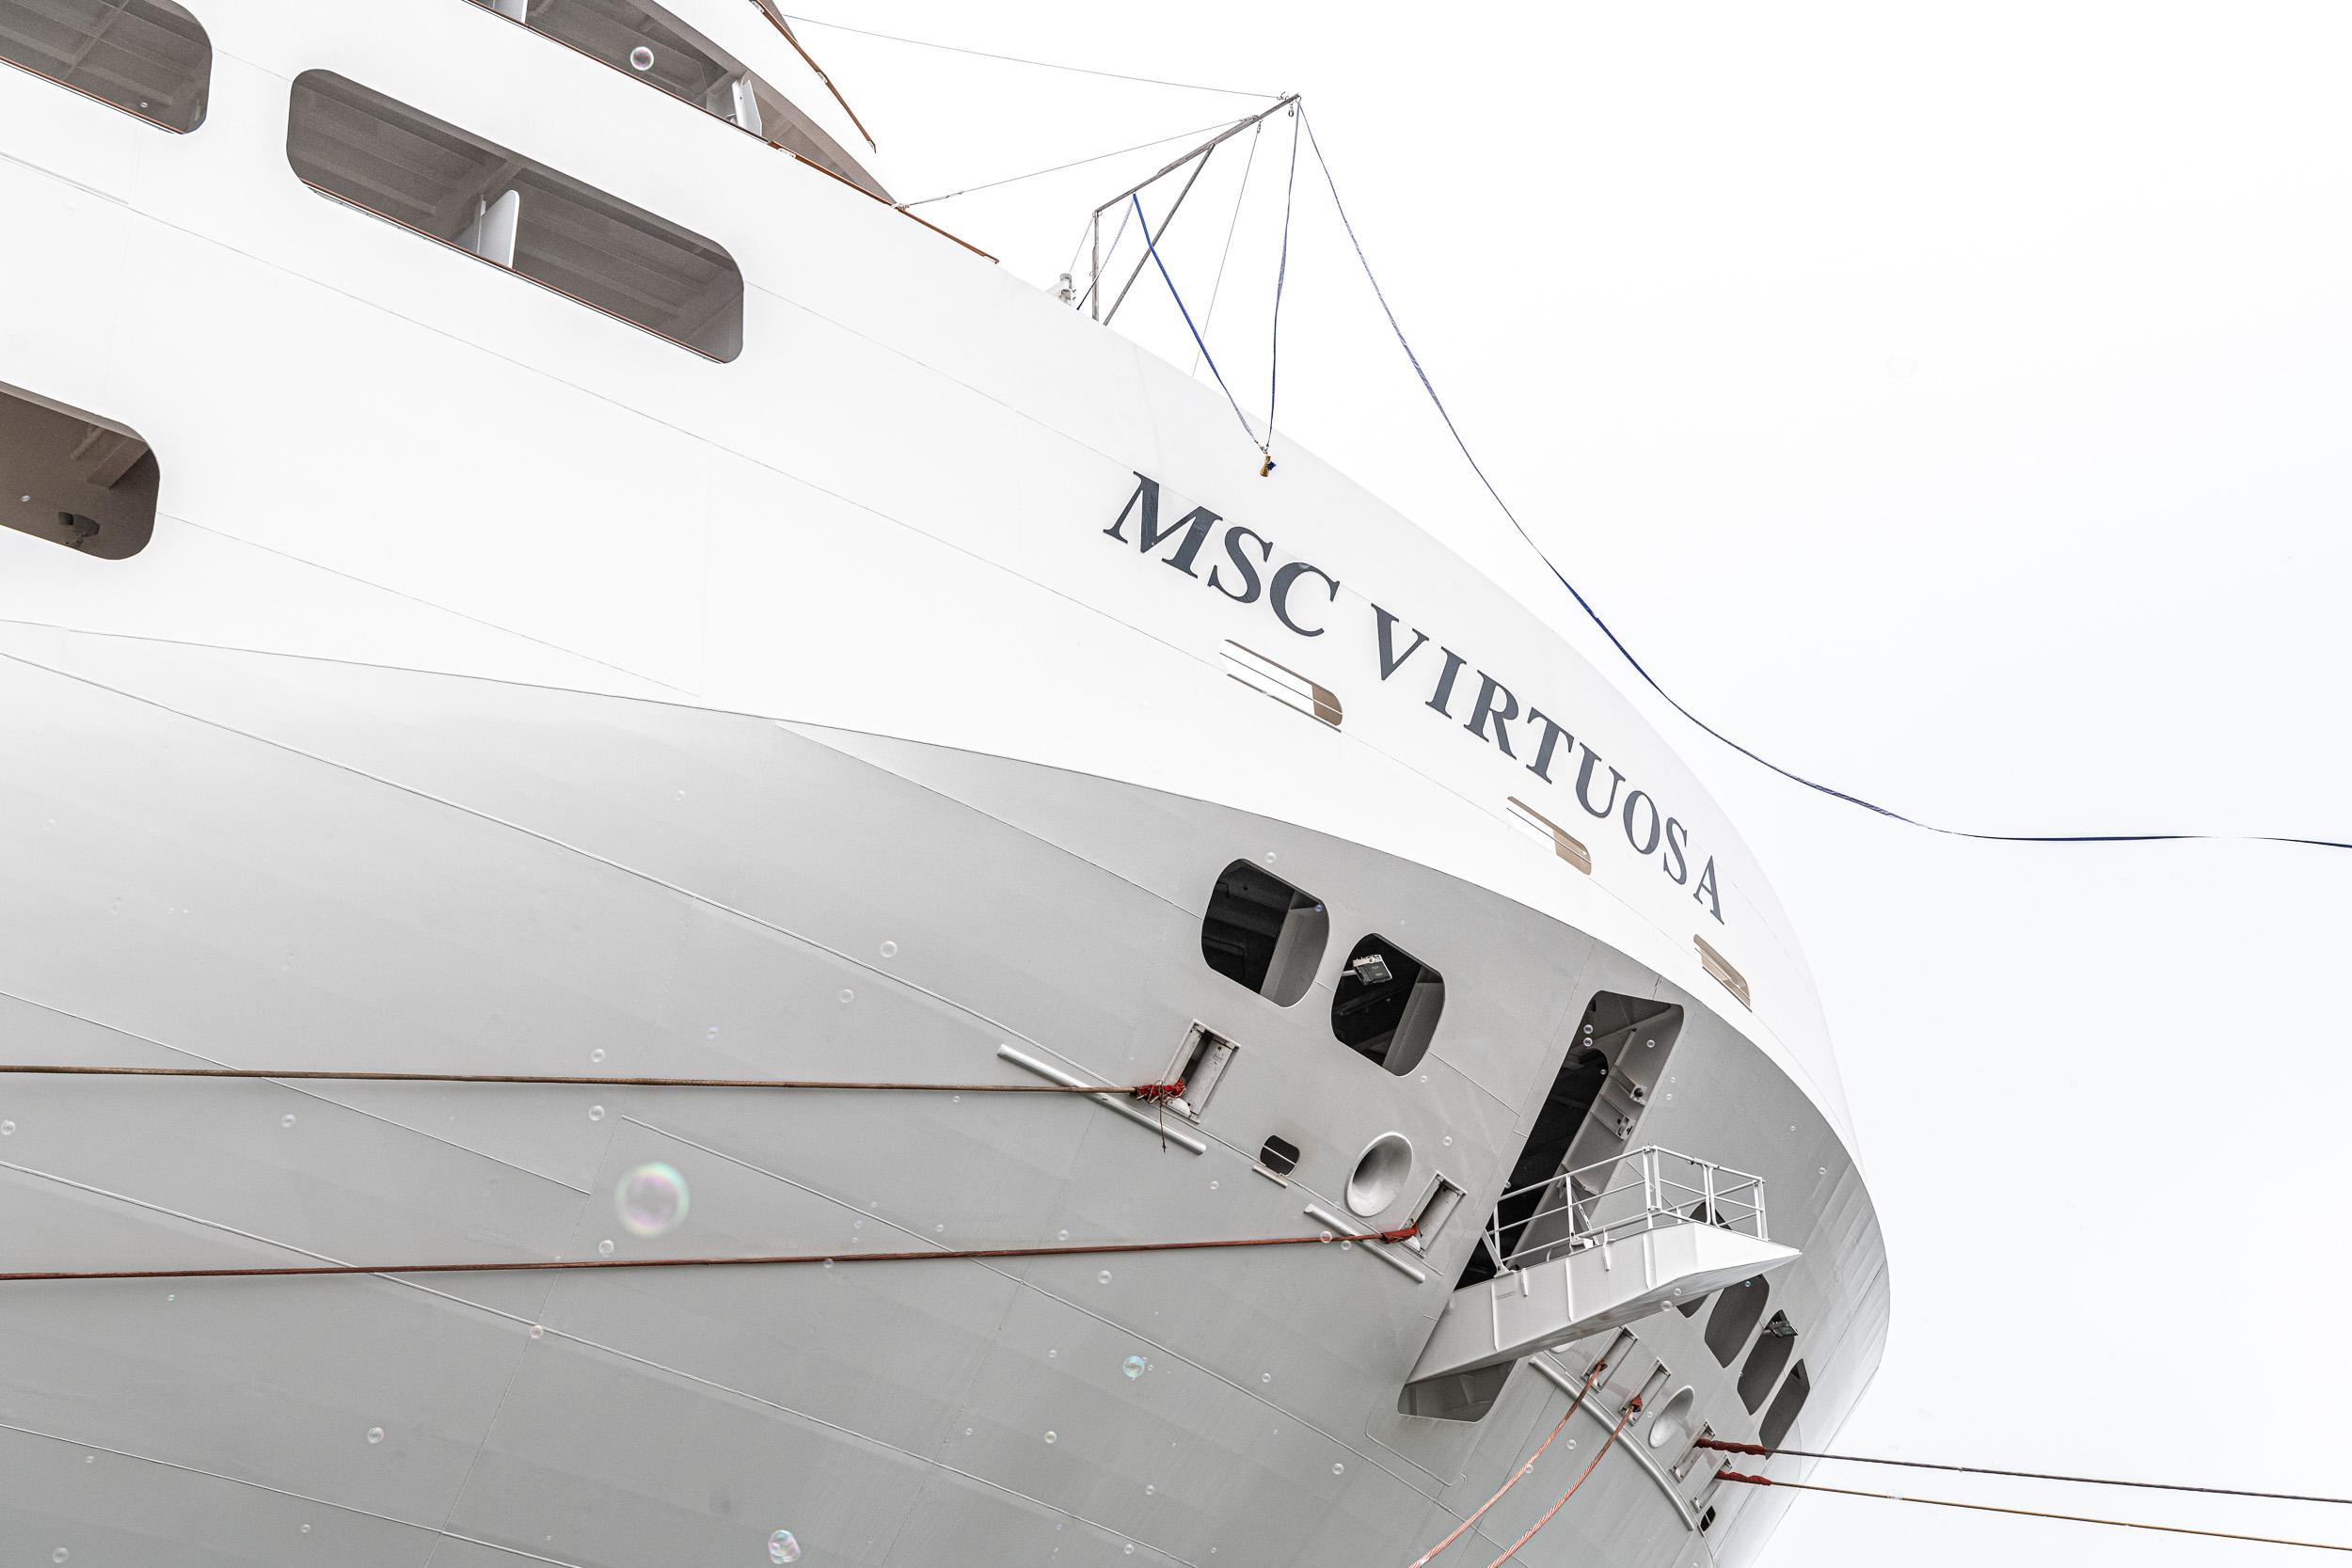 3-msc-virtuosa-delivery